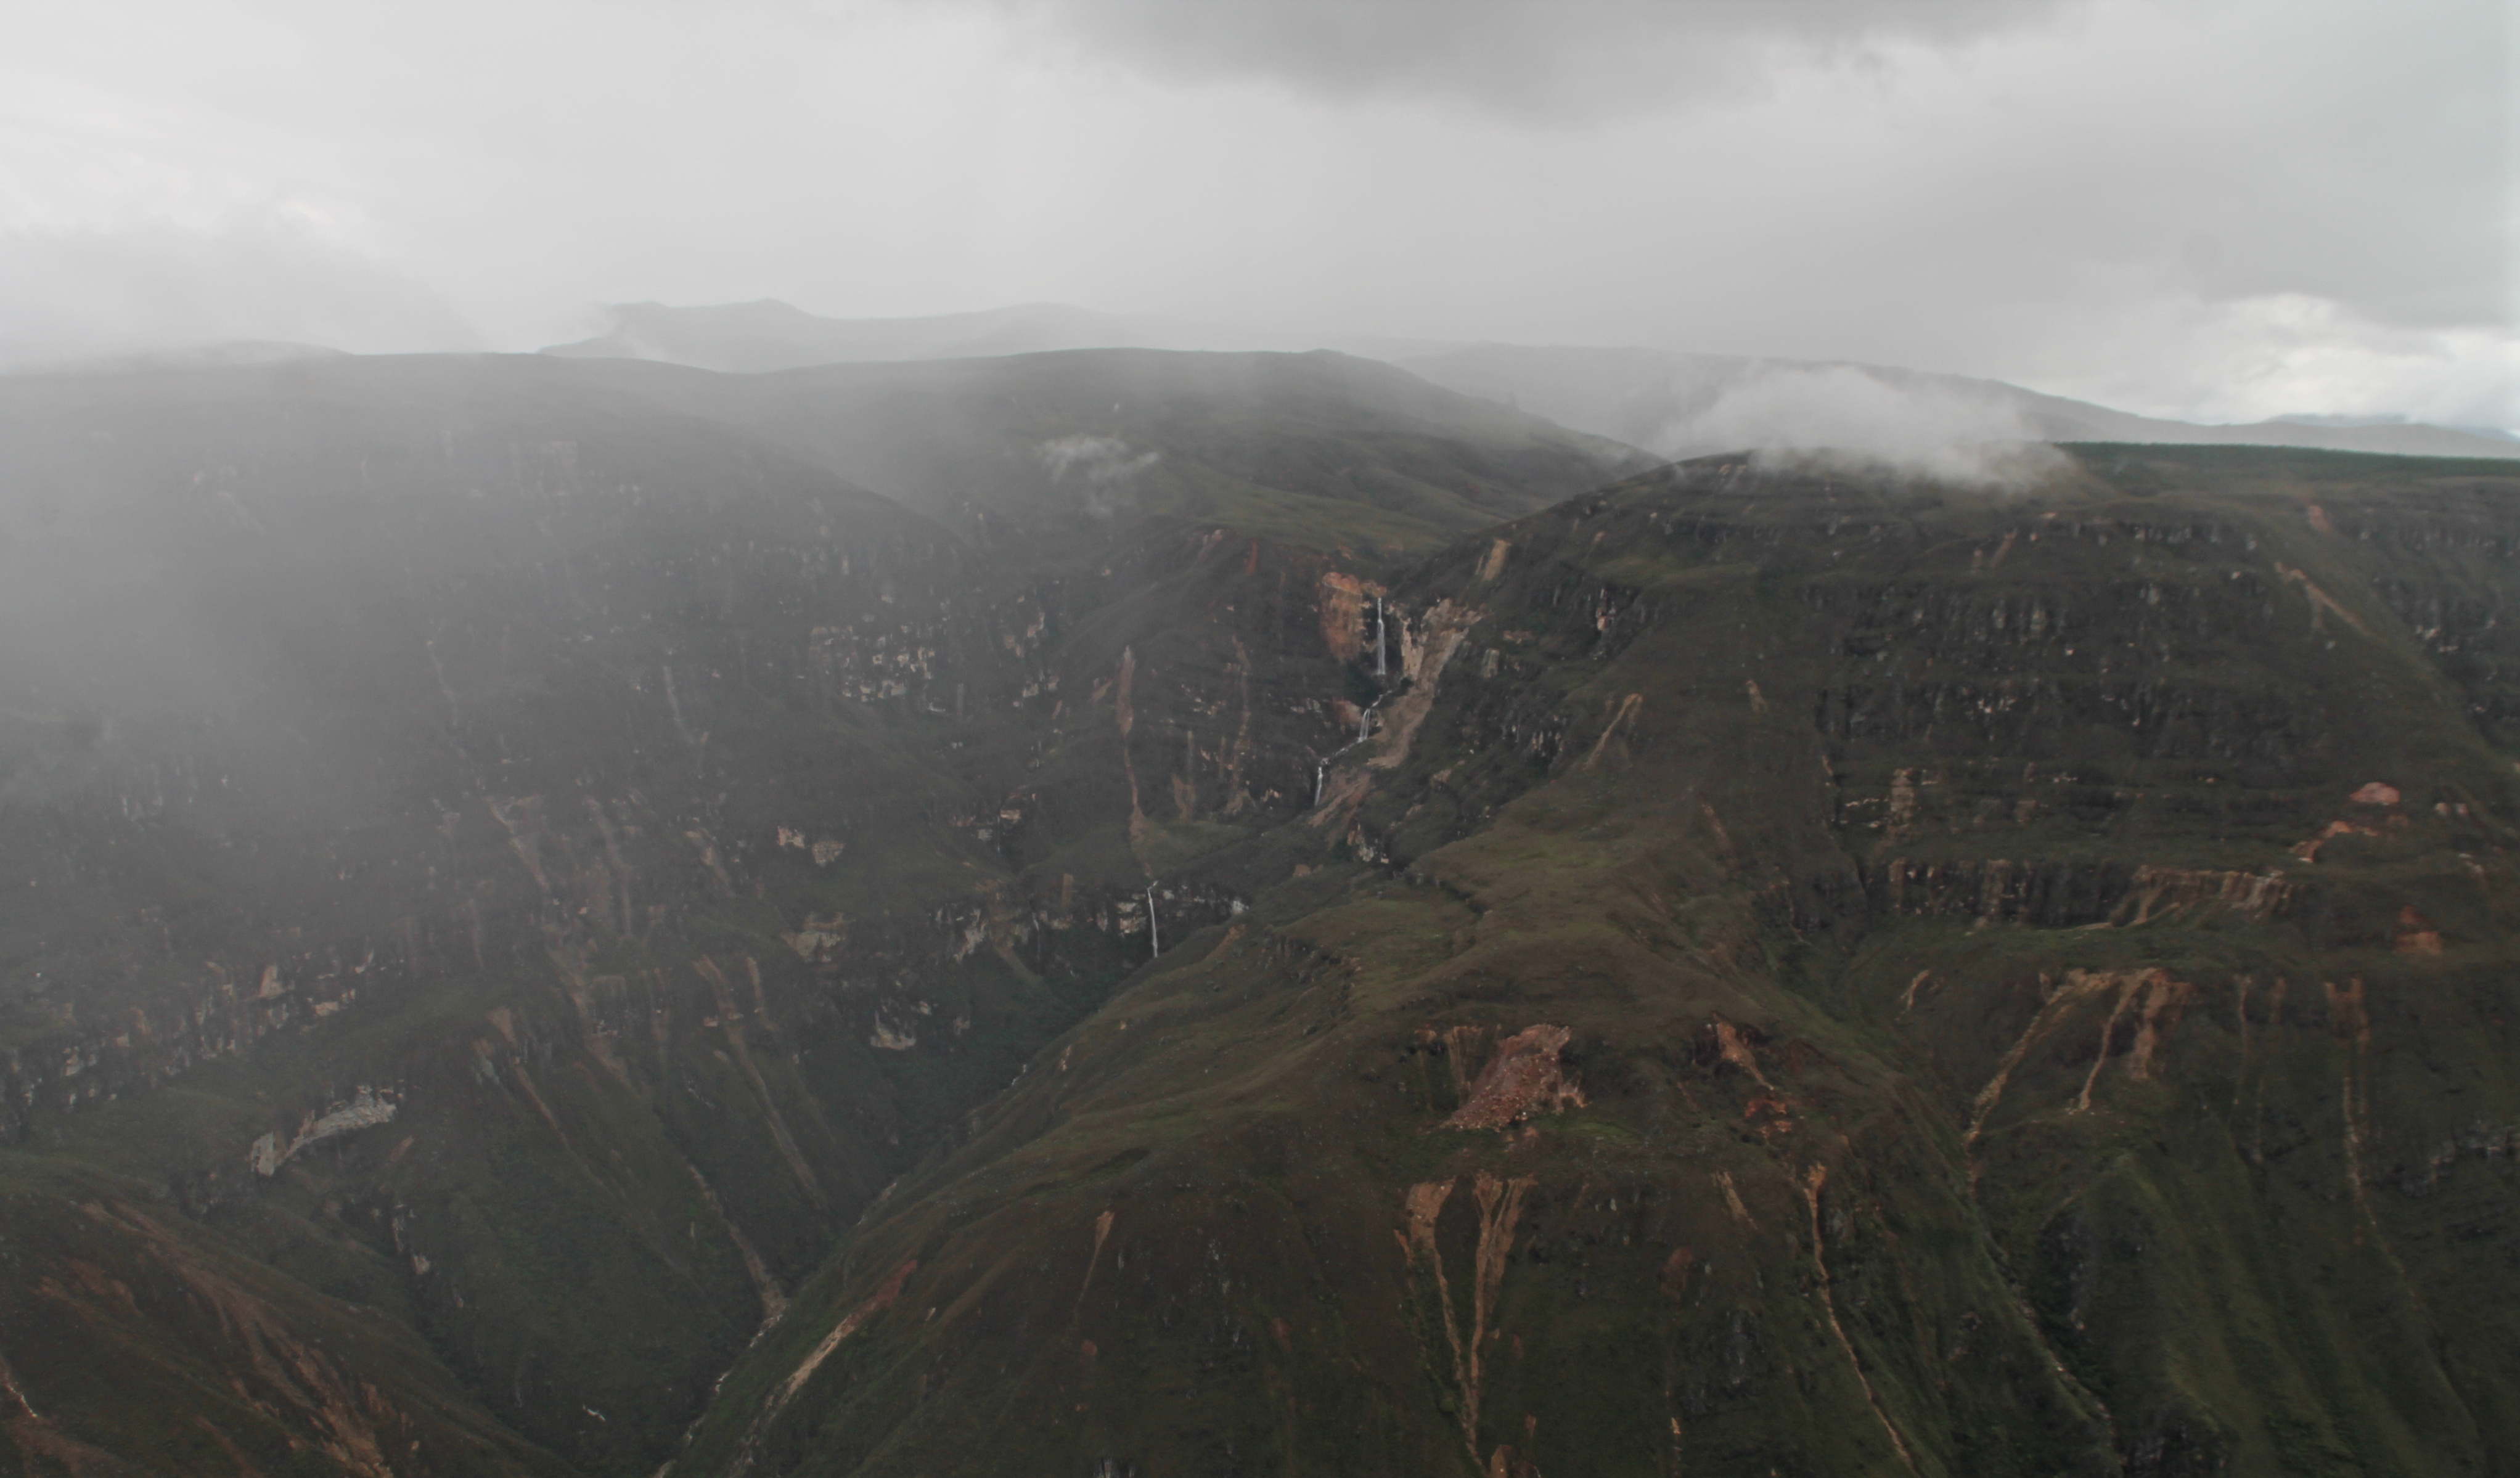 Der Aussichtspunkt Mirador de Huancas lässt sich einfach ab dem Dorf Huancas erreichen.